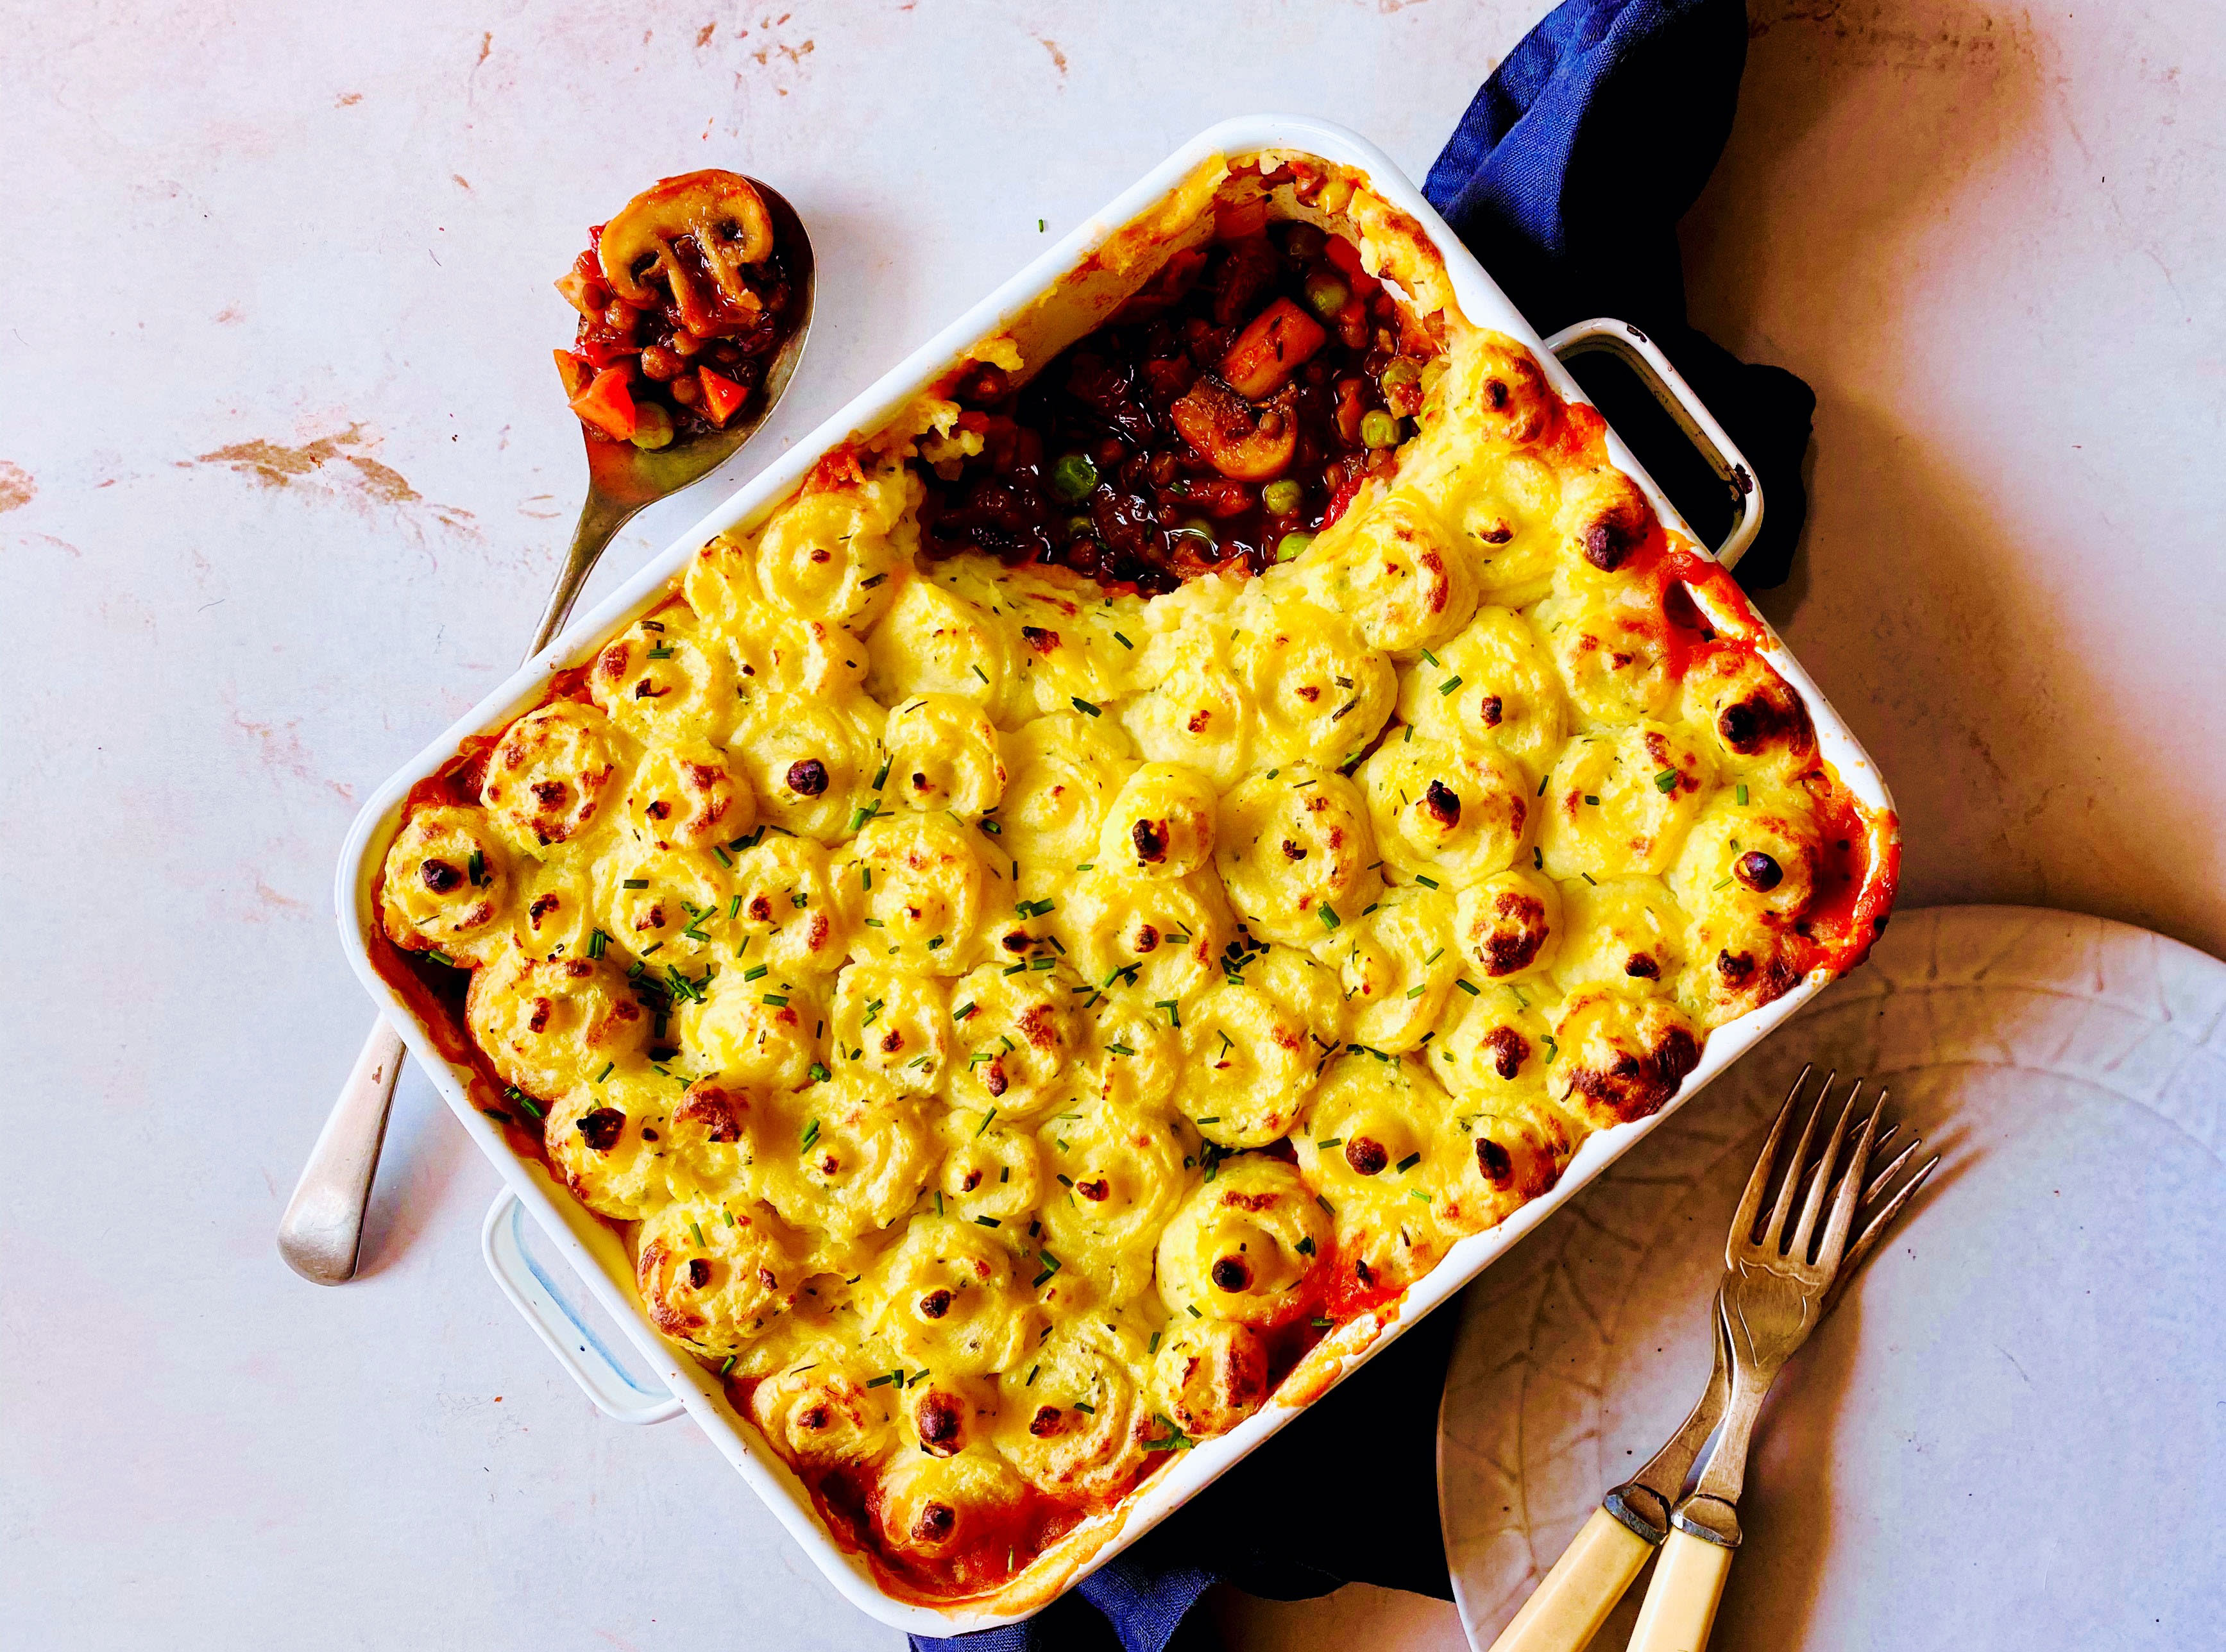 Vegan Cottage Pie with Lentils, Peas and Mushrooms